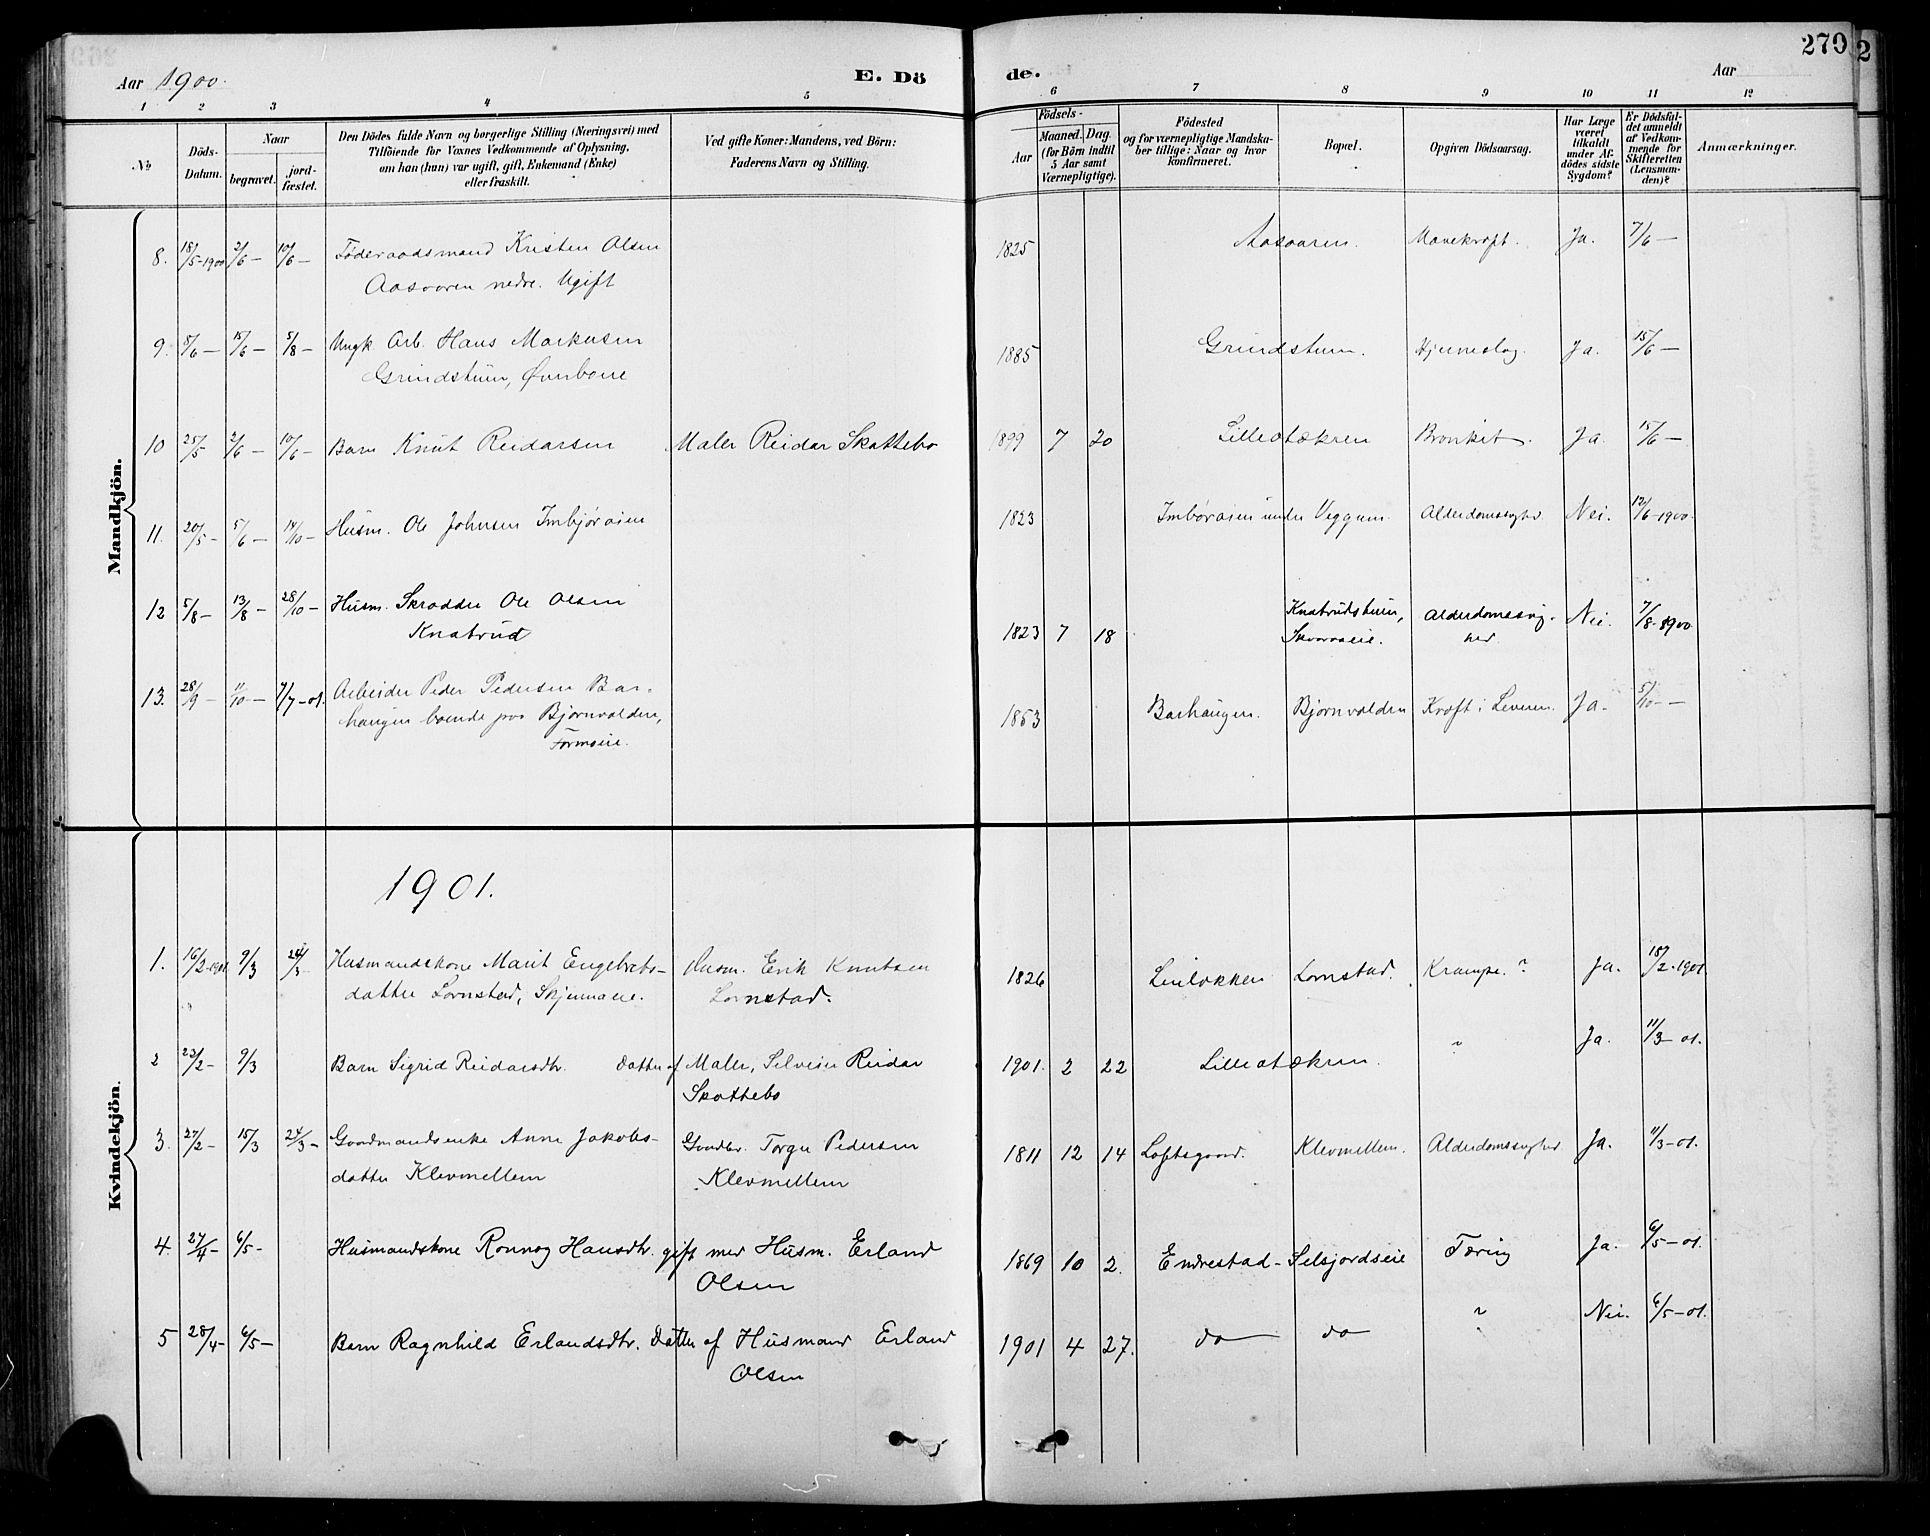 SAH, Sel prestekontor, Klokkerbok nr. 1, 1894-1923, s. 270